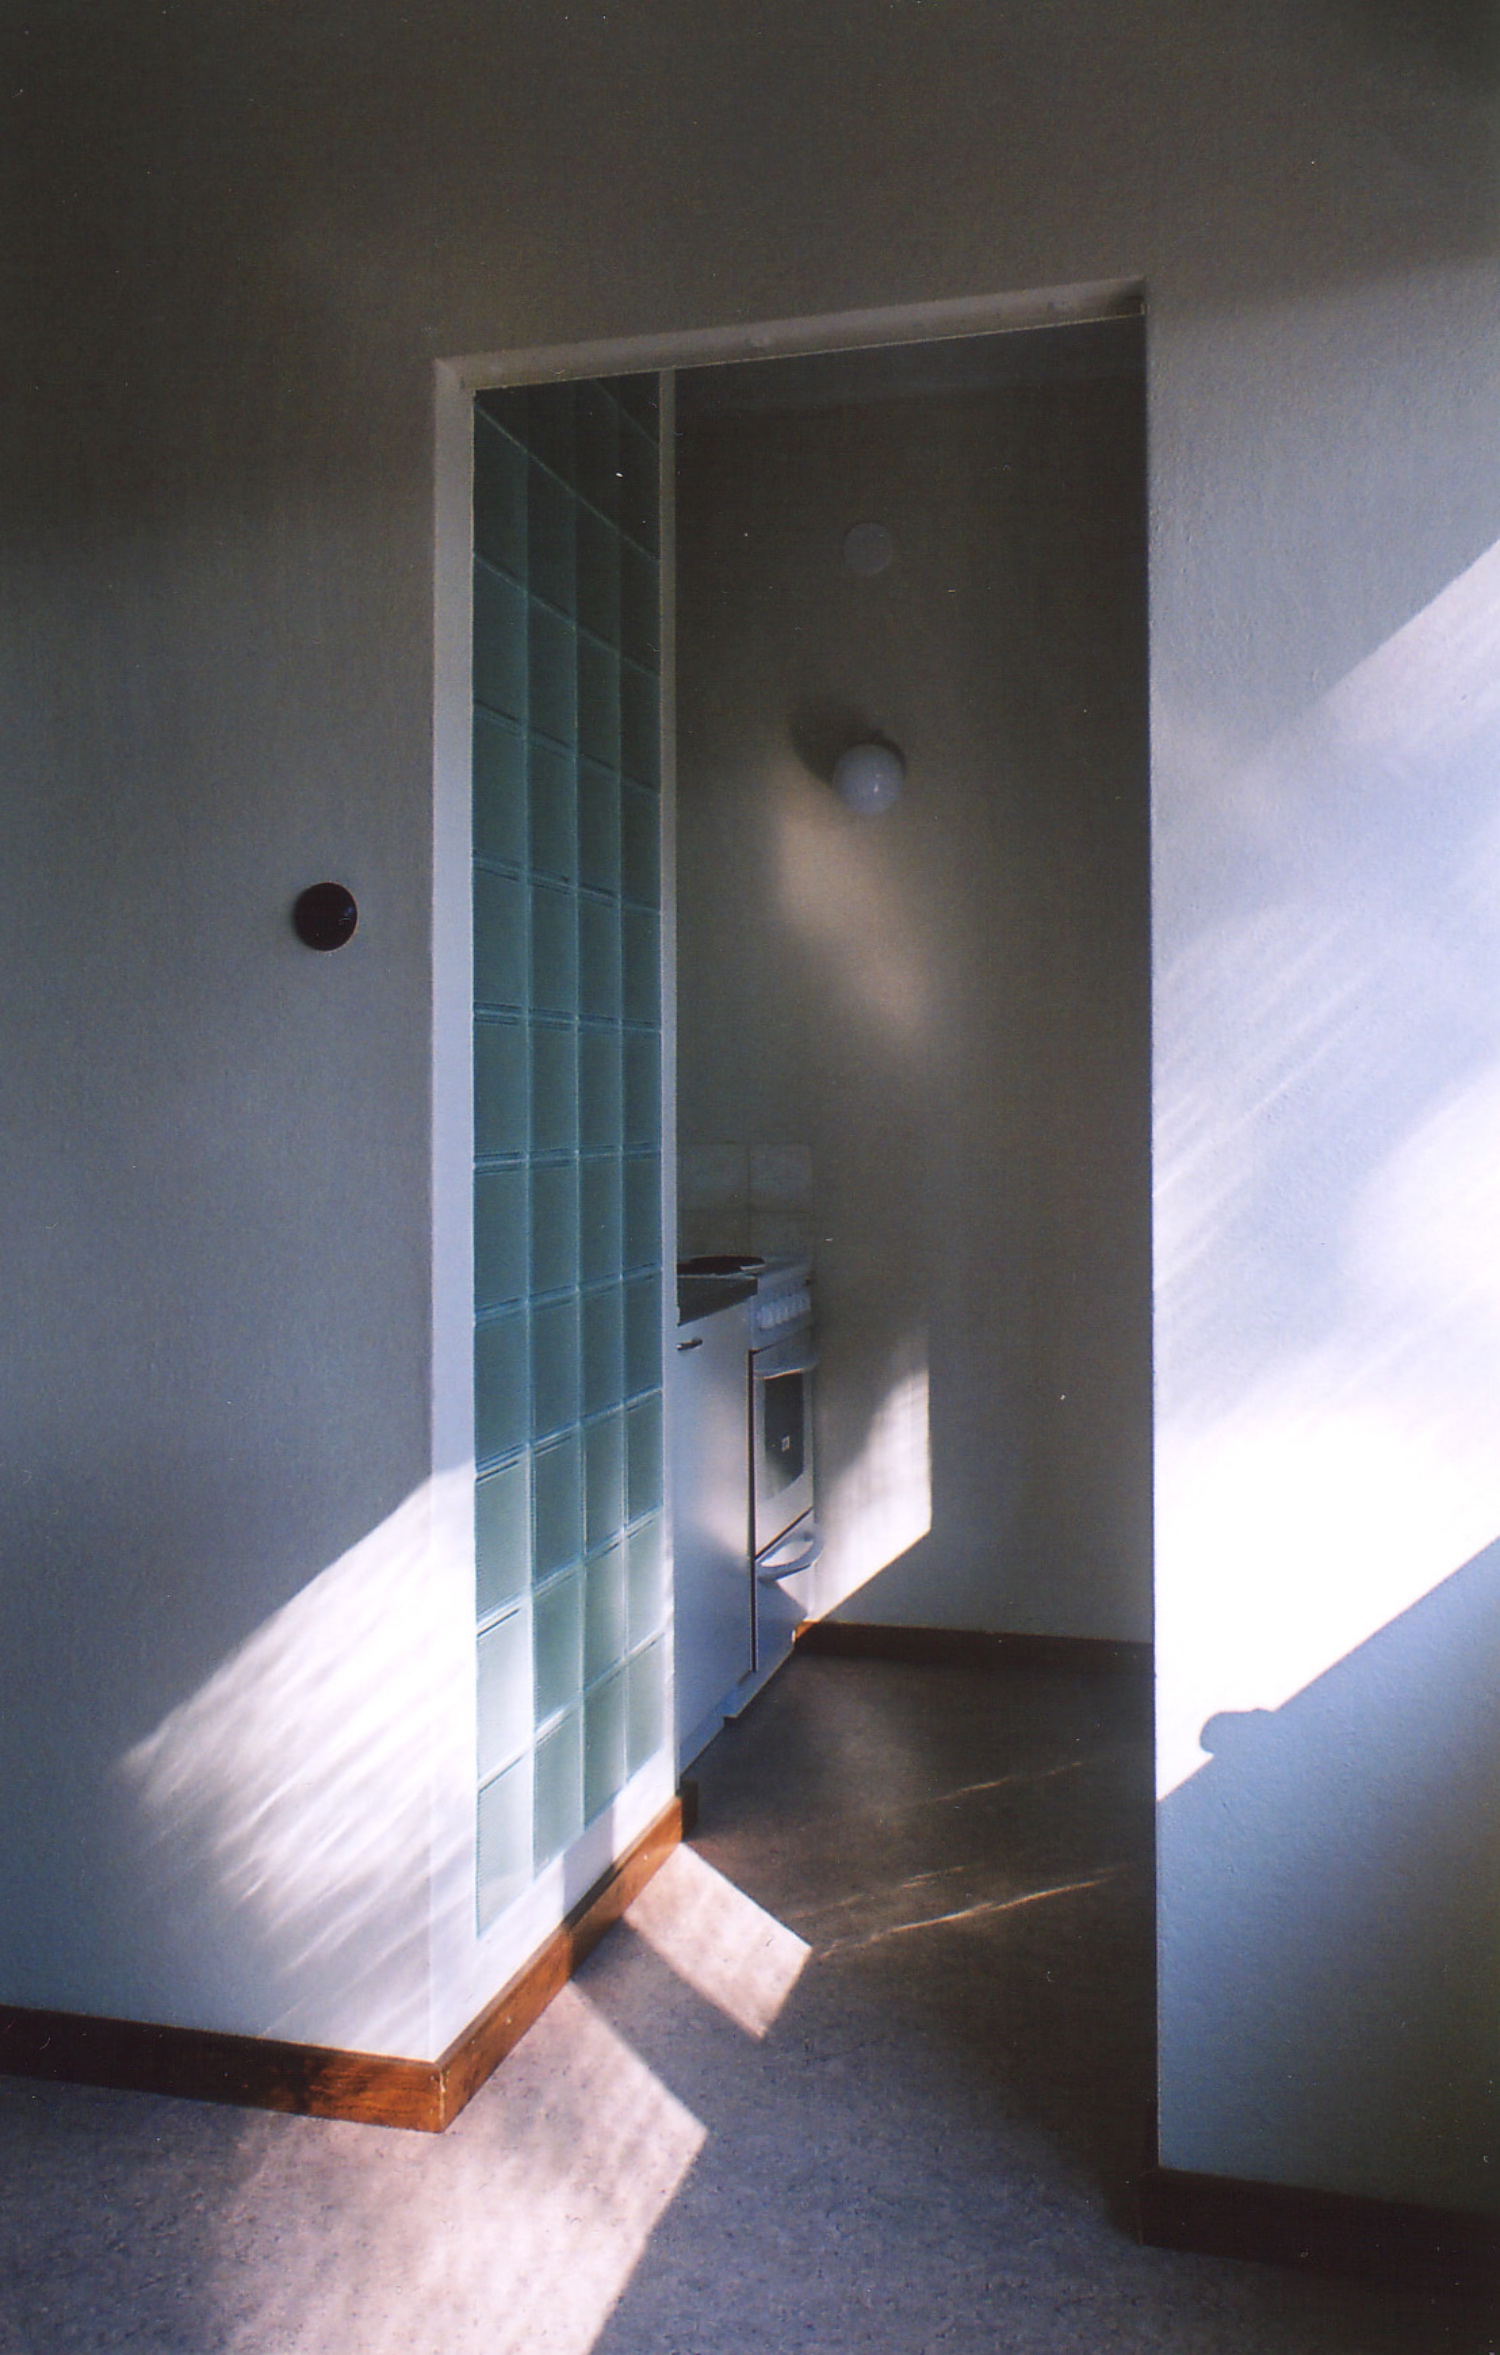 01-02Mäntylä-Honkala-Peruskorjattu-keittiö2 copy.jpg